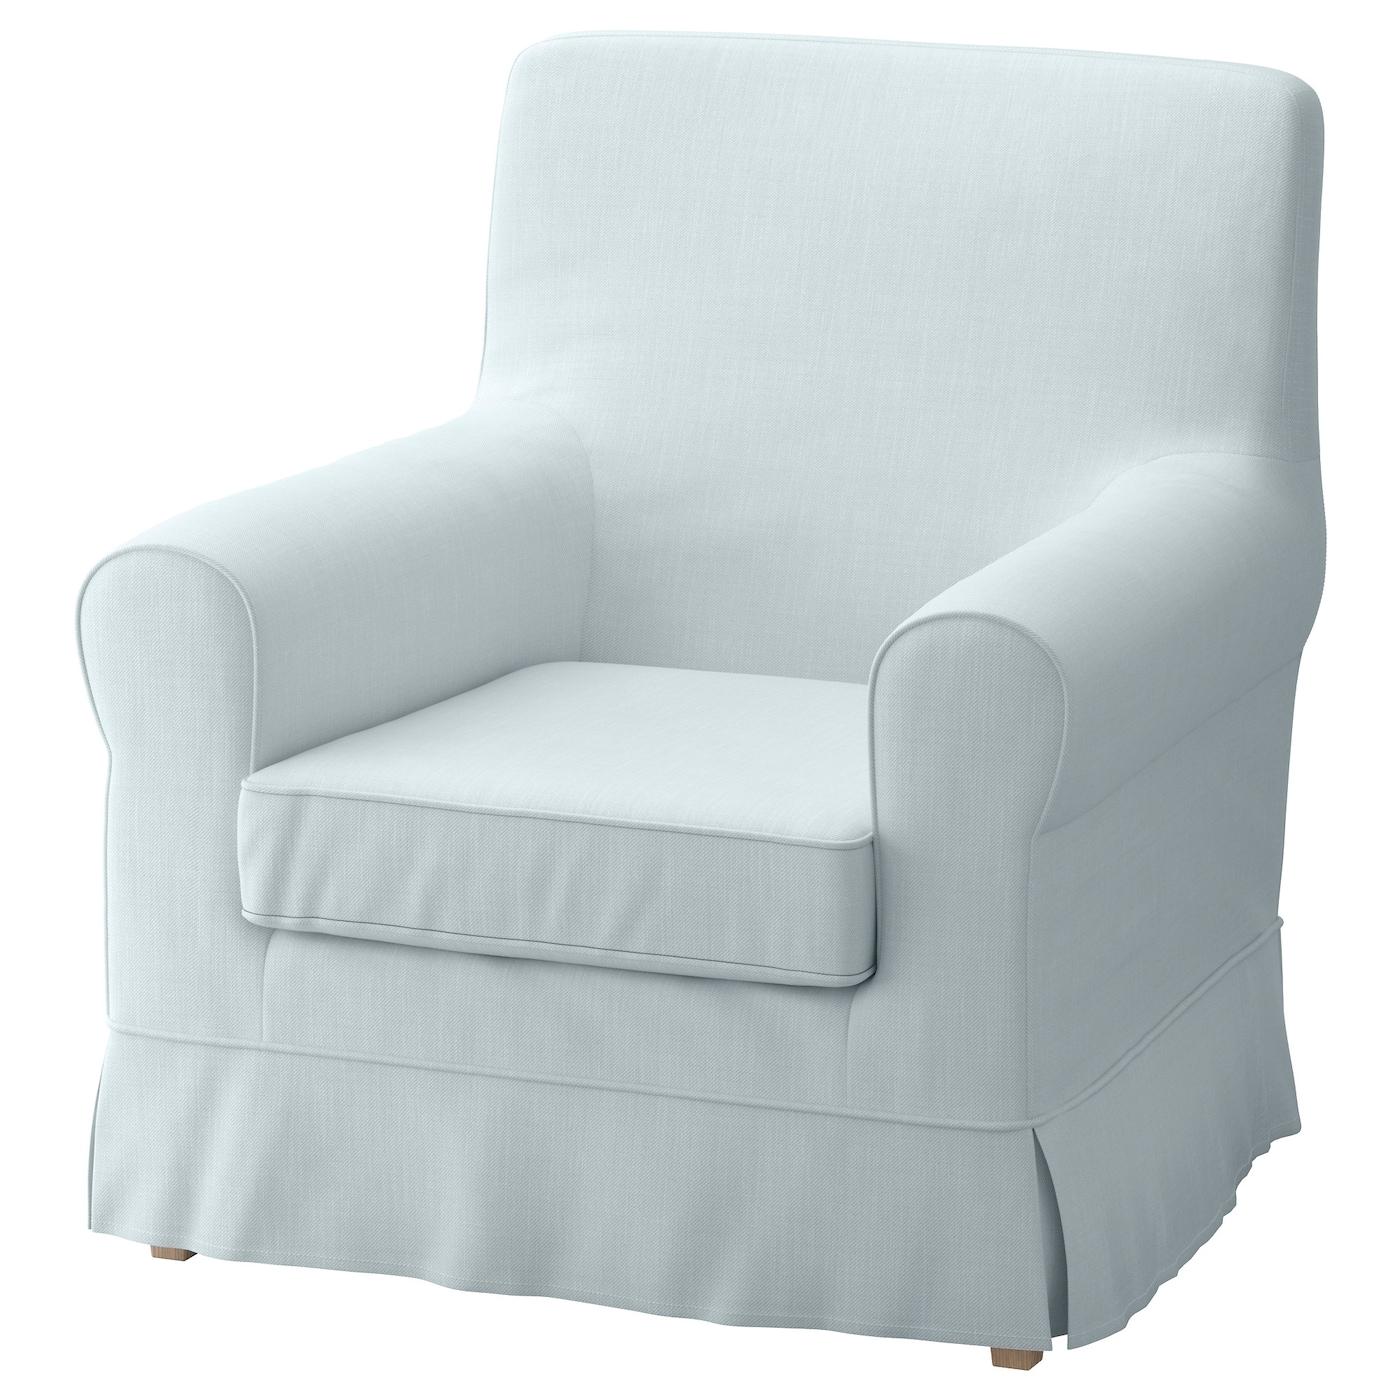 jennylund fauteuil nordvalla bleu clair ikea. Black Bedroom Furniture Sets. Home Design Ideas